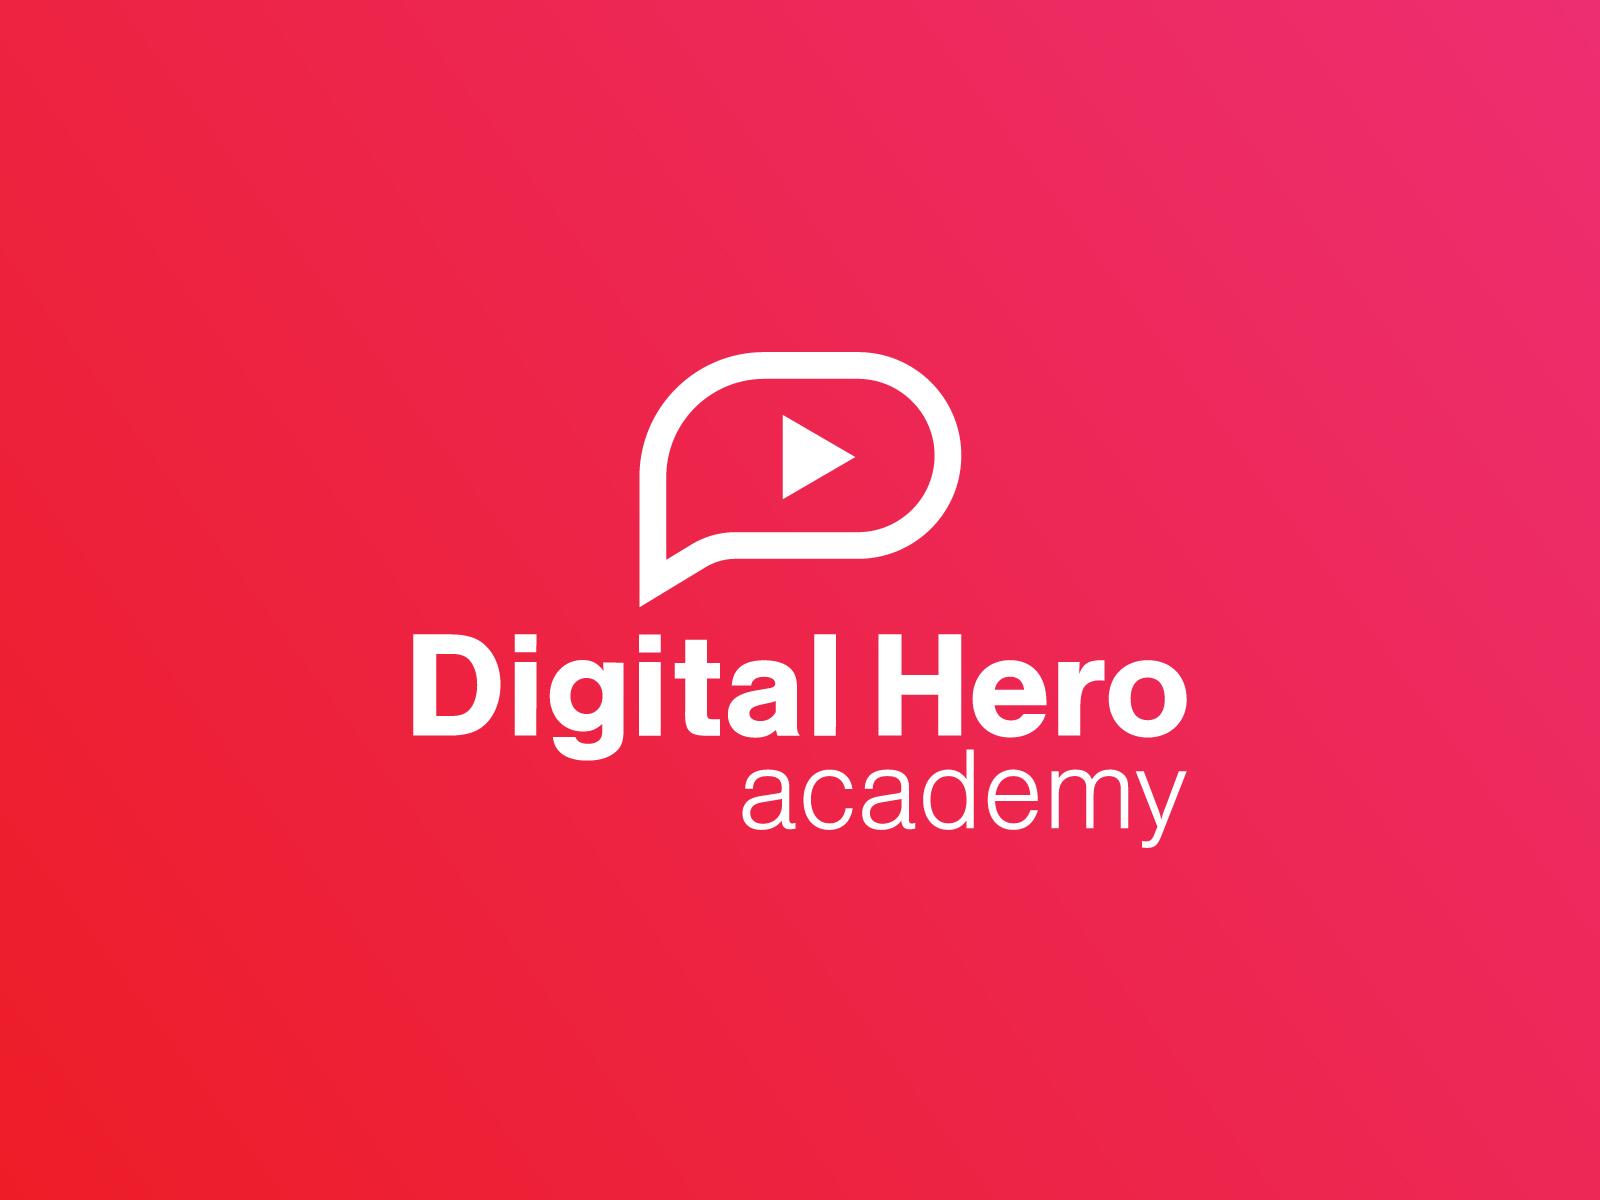 Neato Creative Digital Hero Academy Logo